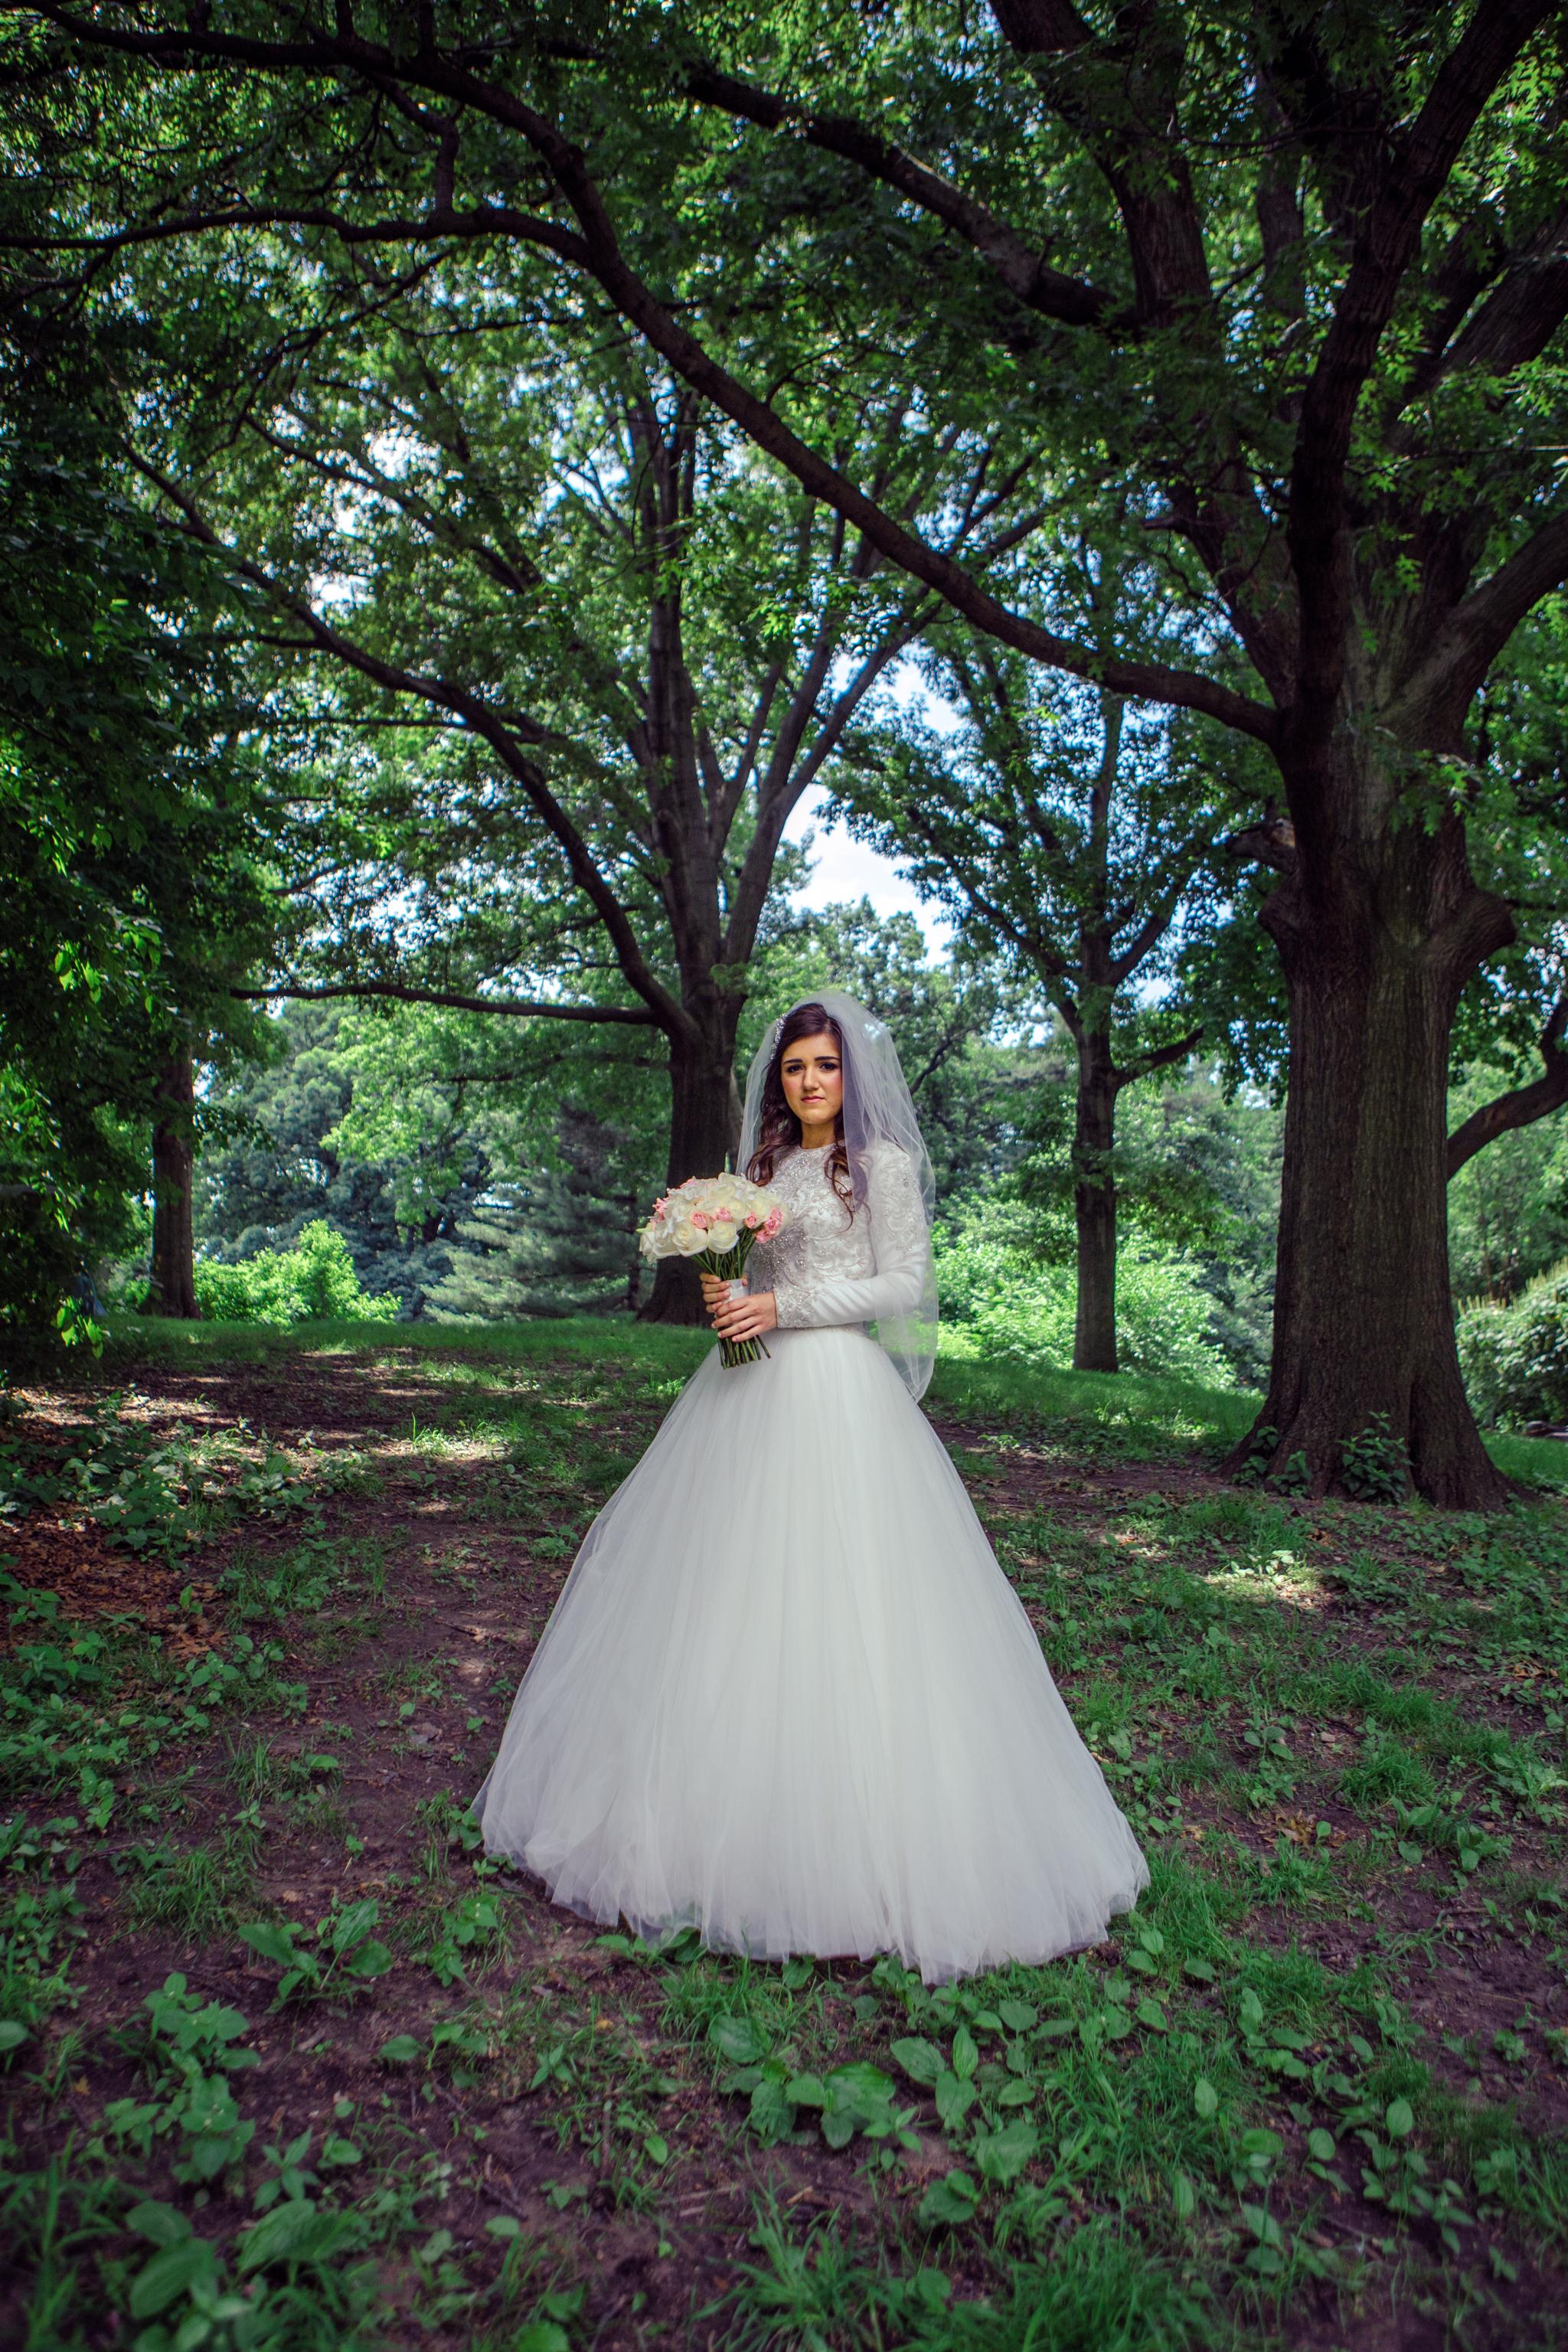 Wedding Iossi and Gitty Khafif  - Eliau Piha studio photography, new york, events, people 770 brooklyn -0091.jpg